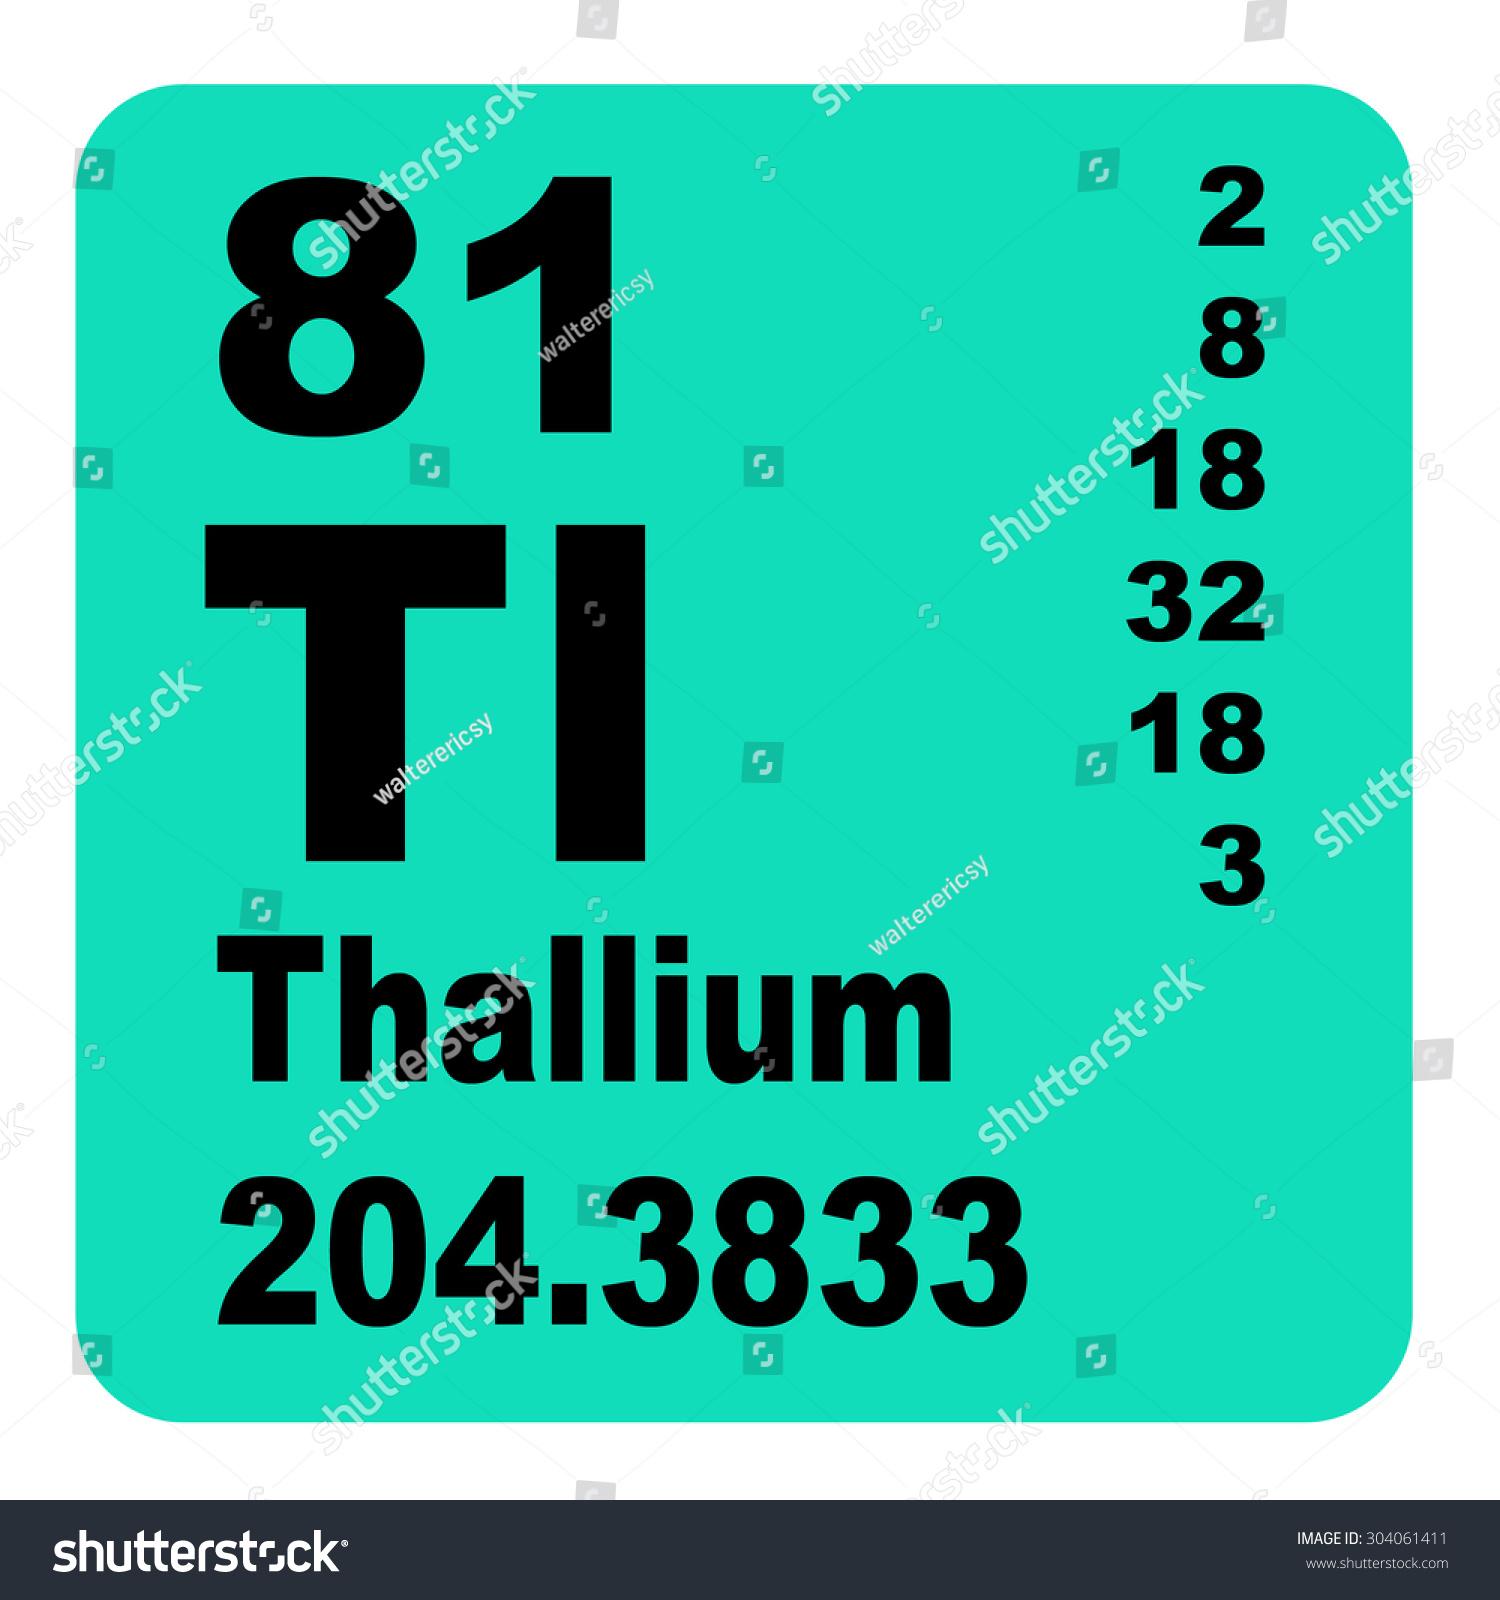 Thallium Periodic Table Elements Stock Illustration Royalty Free